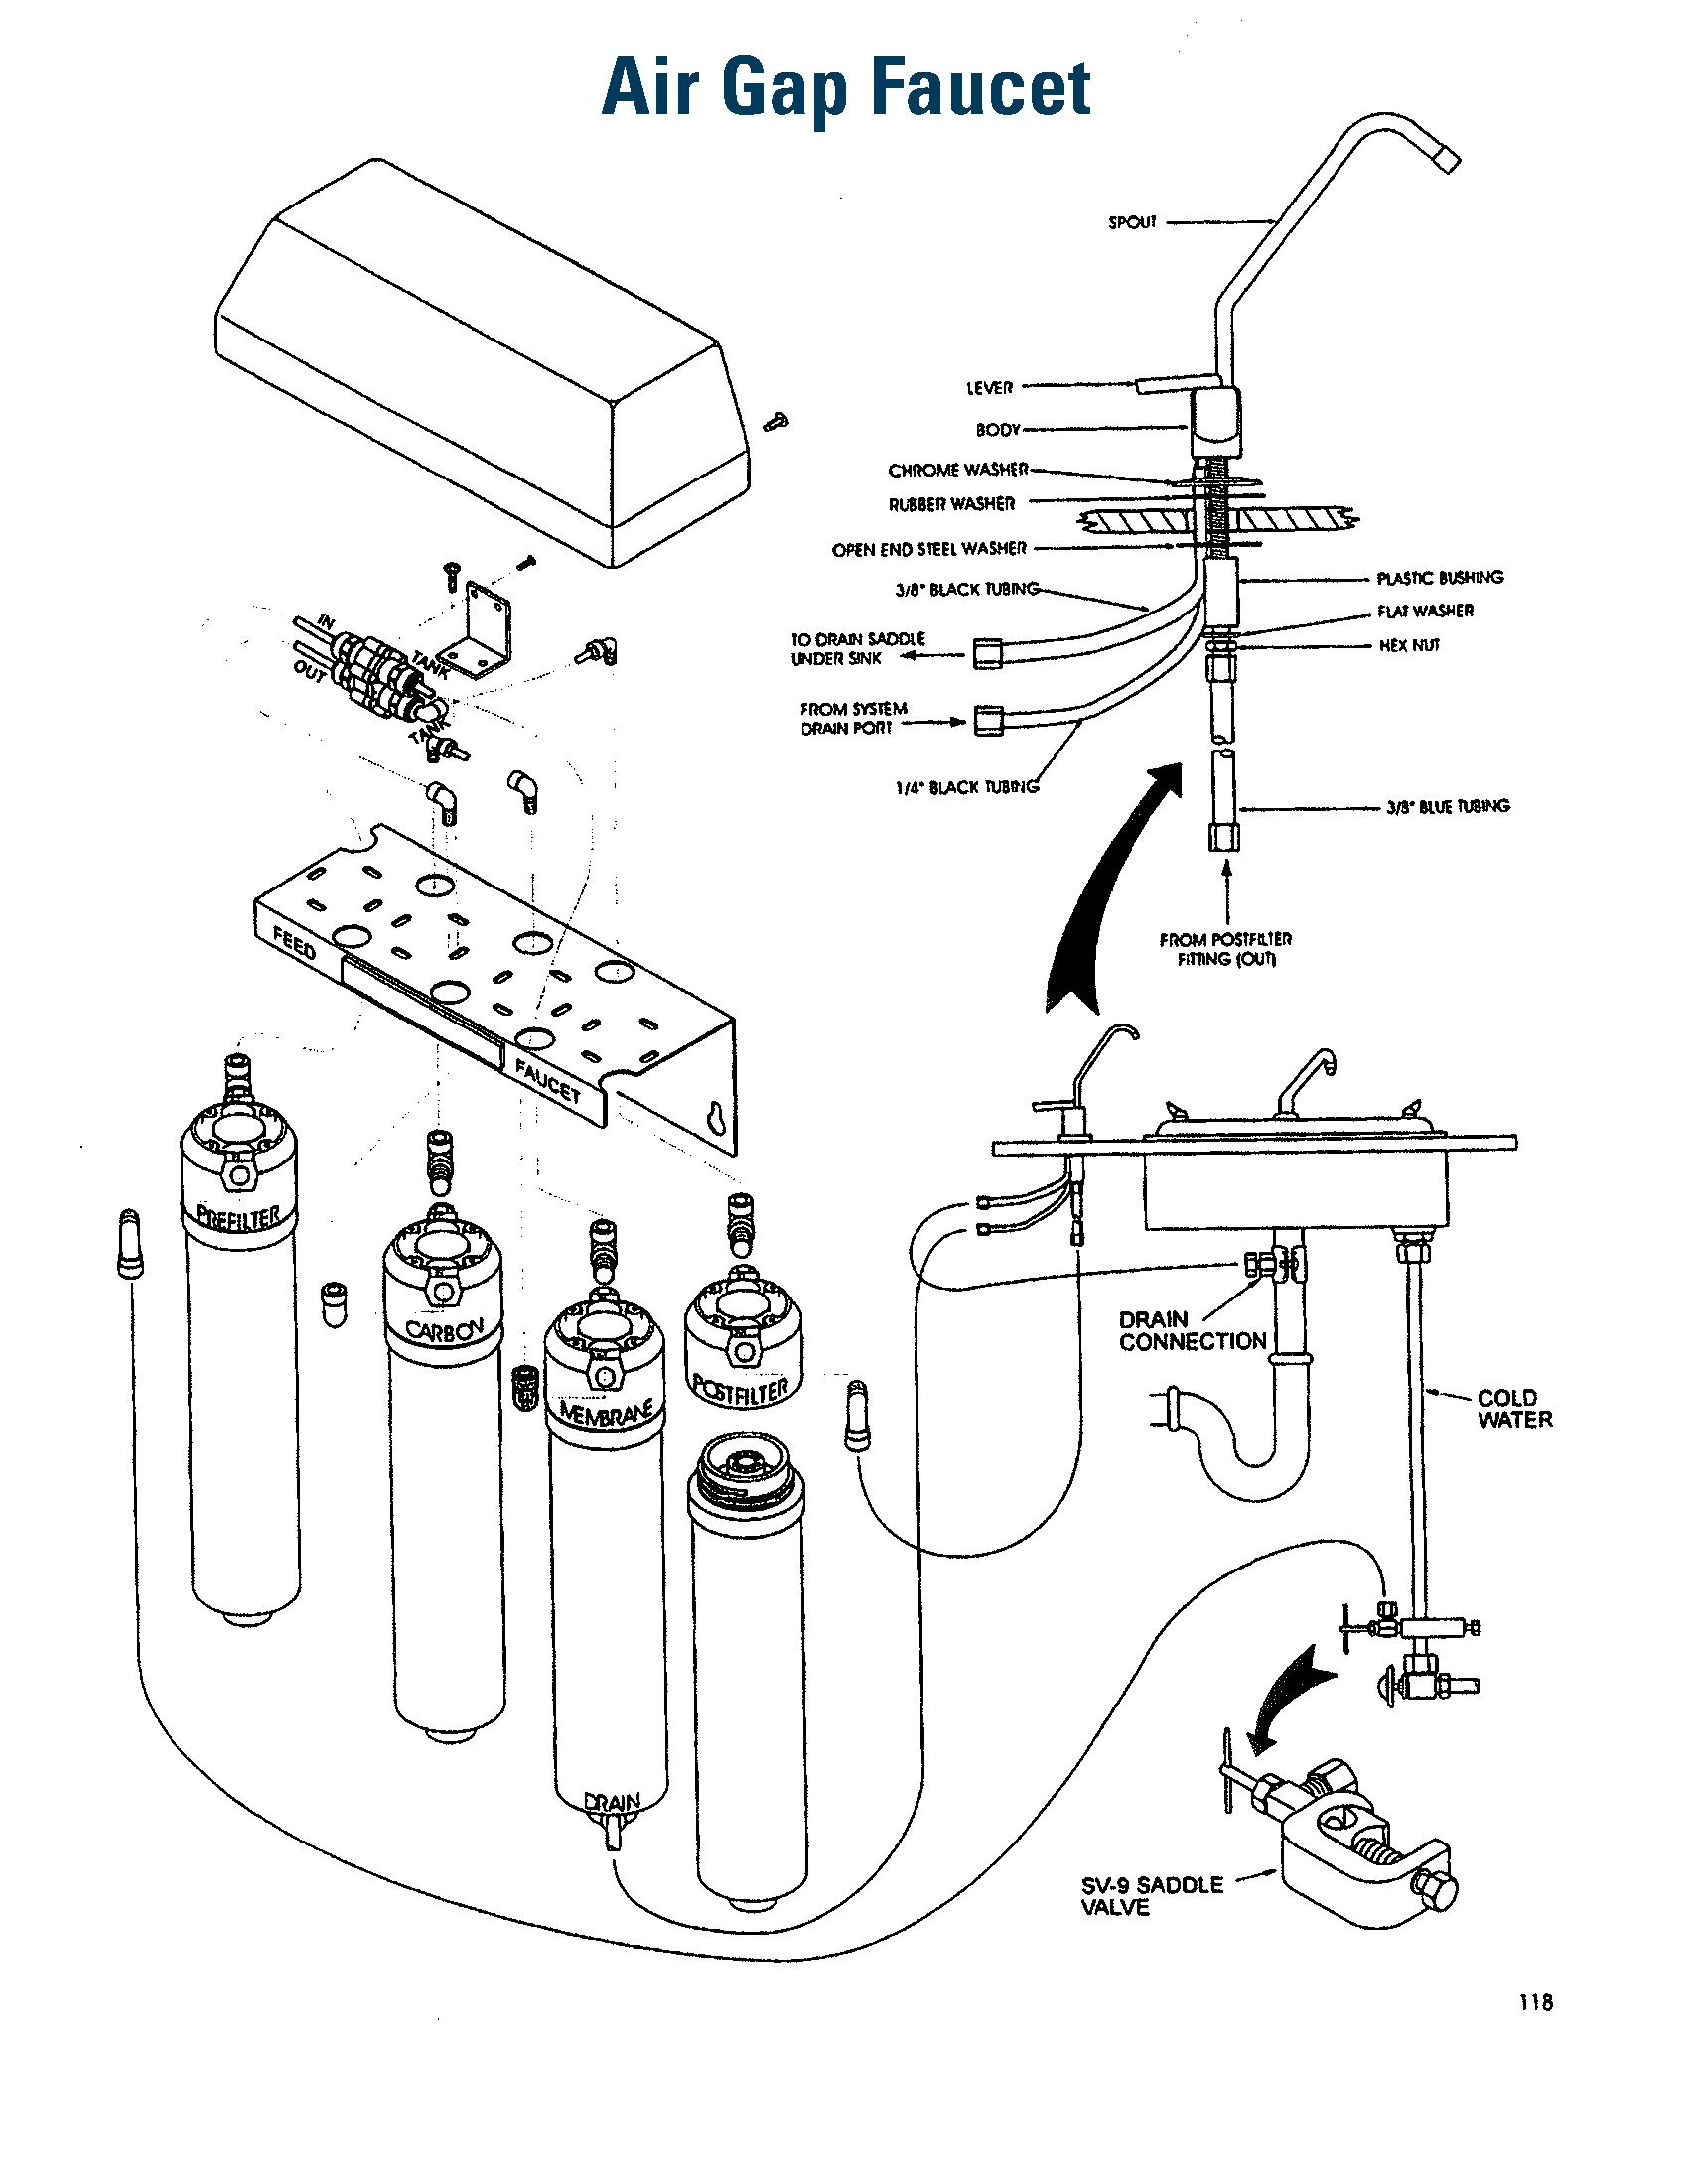 Water Faucet Drawing At Getdrawings